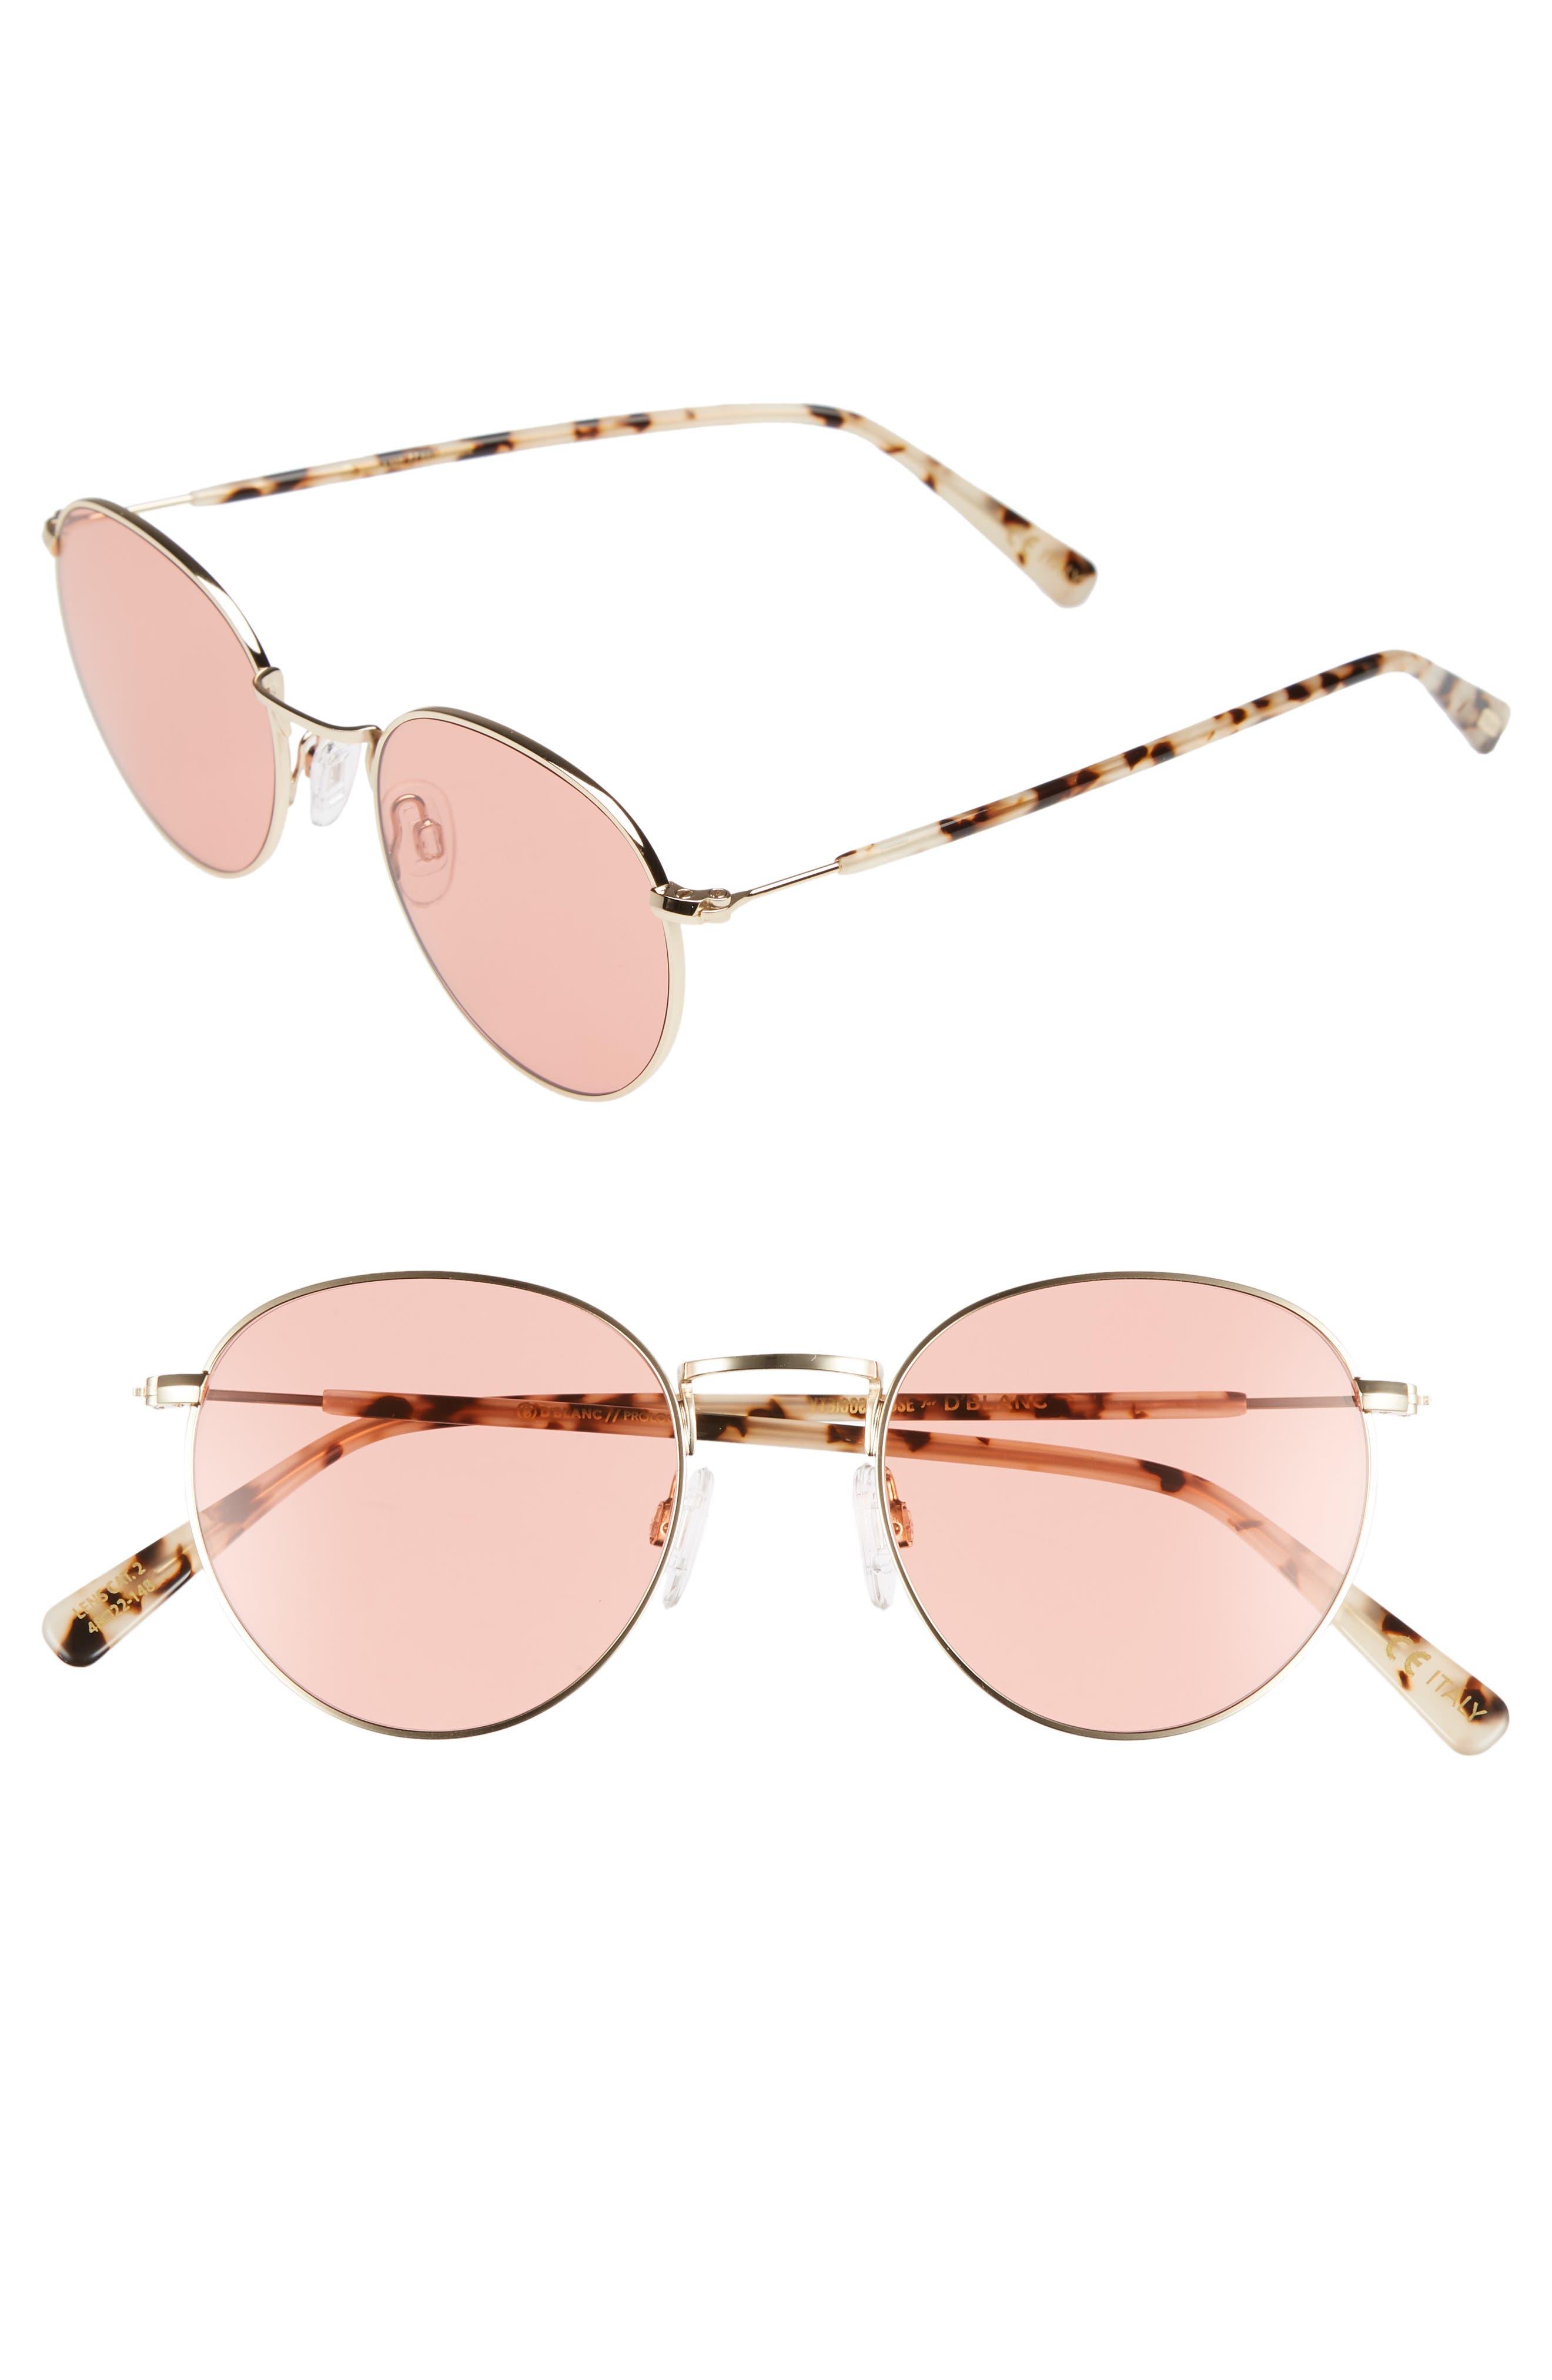 D'BLANC Prologue 48mm Sunglasses,                         Main,                         color, 710